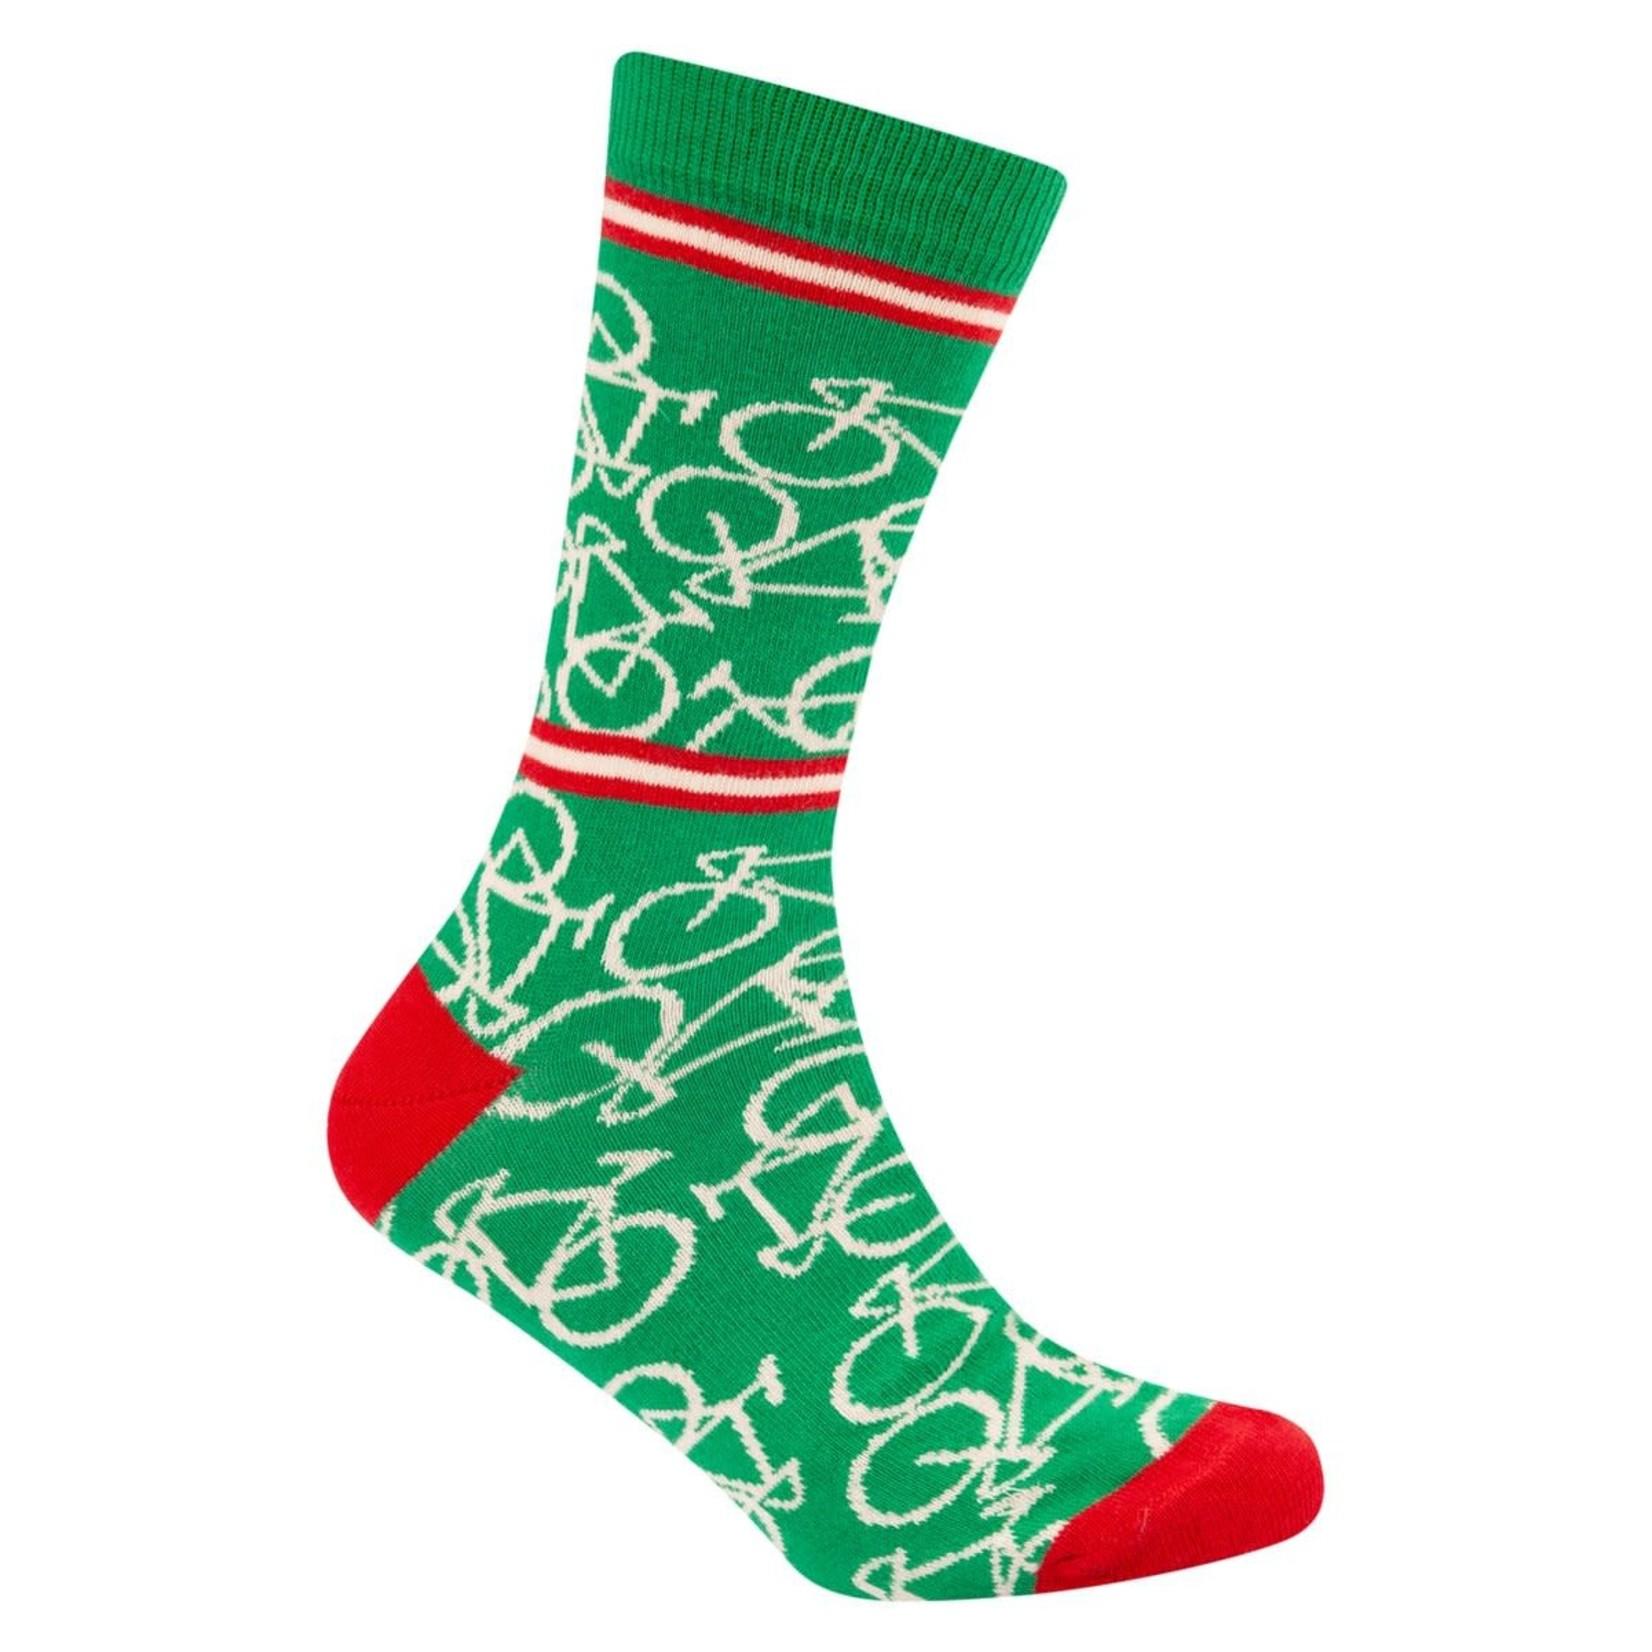 Sokken 'Le Patron' Bicycle socks Italian green